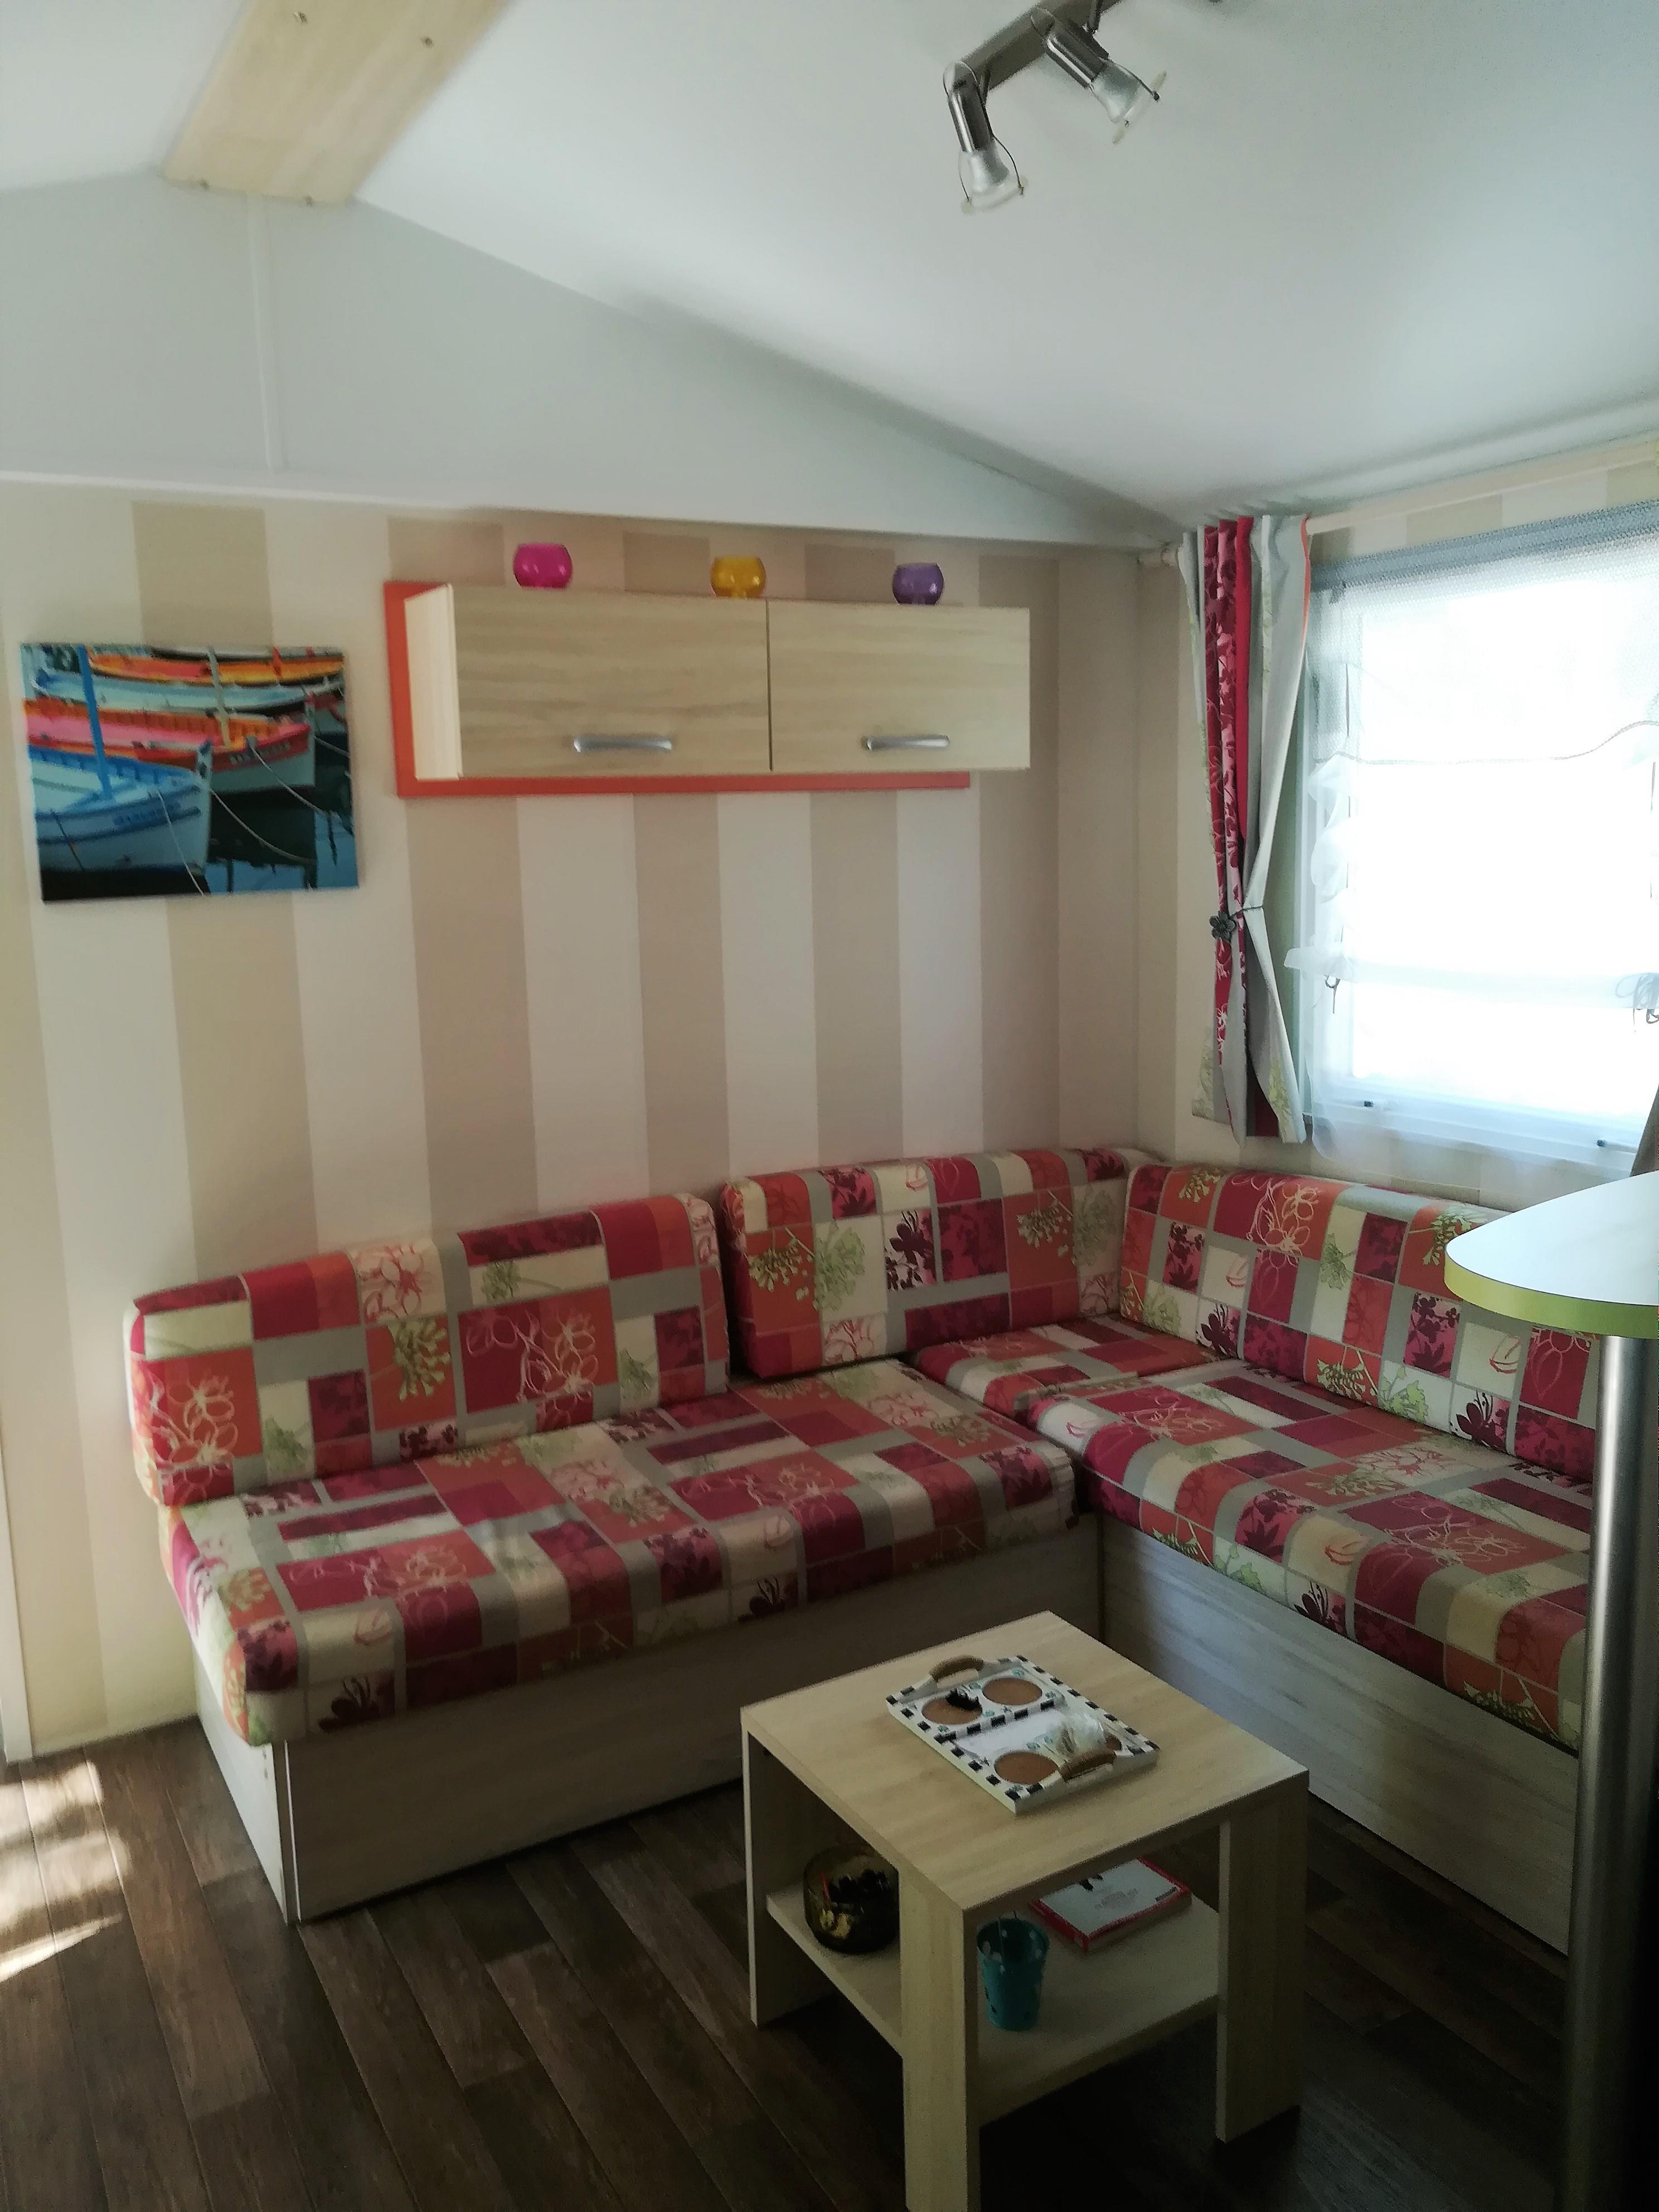 Location - Mobilhome Super Titania Confort - 2 Chambres (Z09) - Camping Le Logis du Breuil